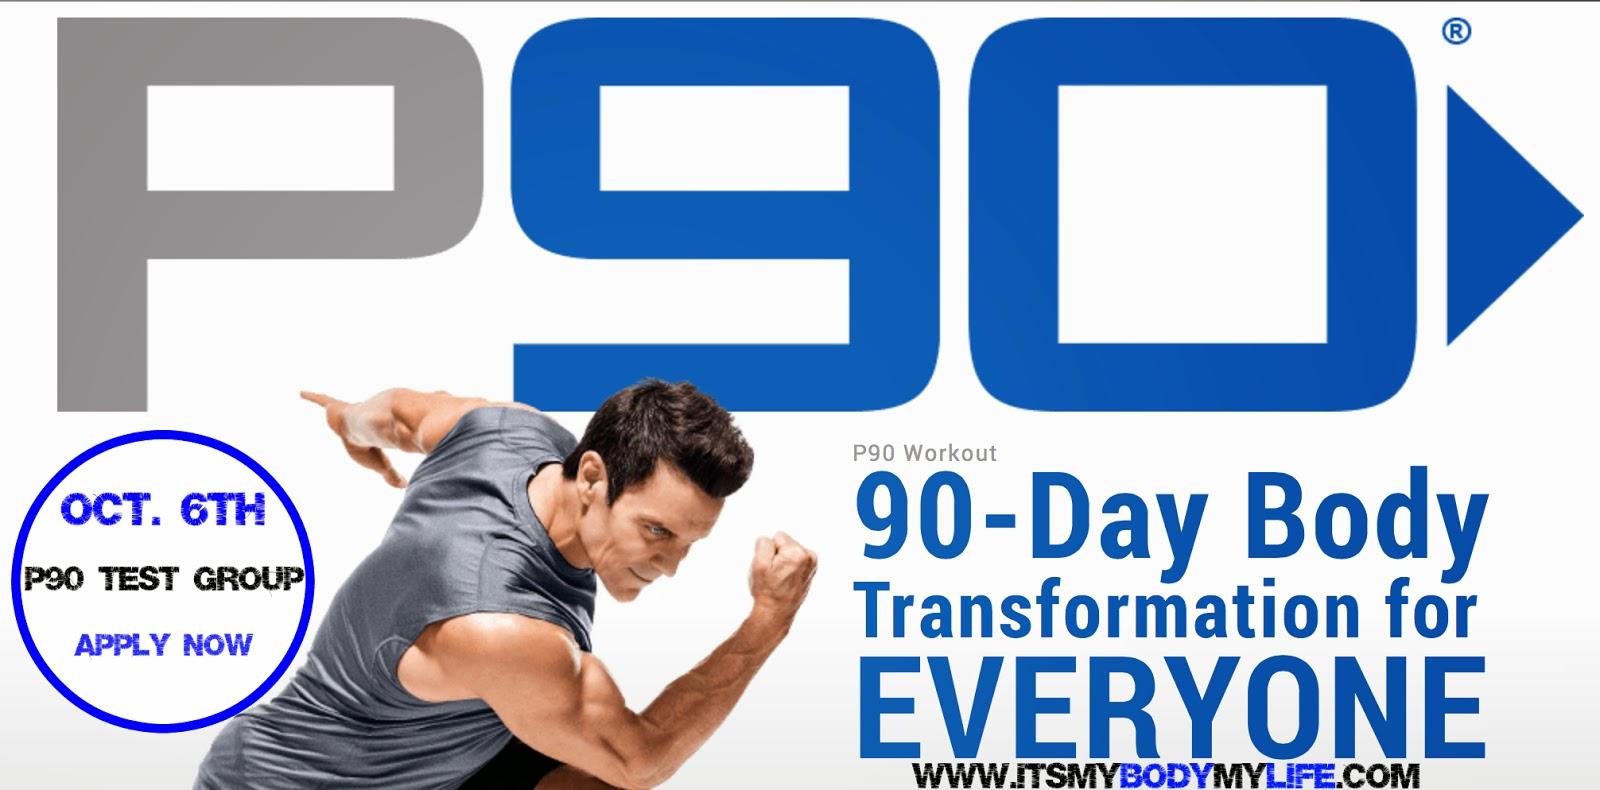 p90, p90 challenge group, p90 test group, p90 results, tony horton,